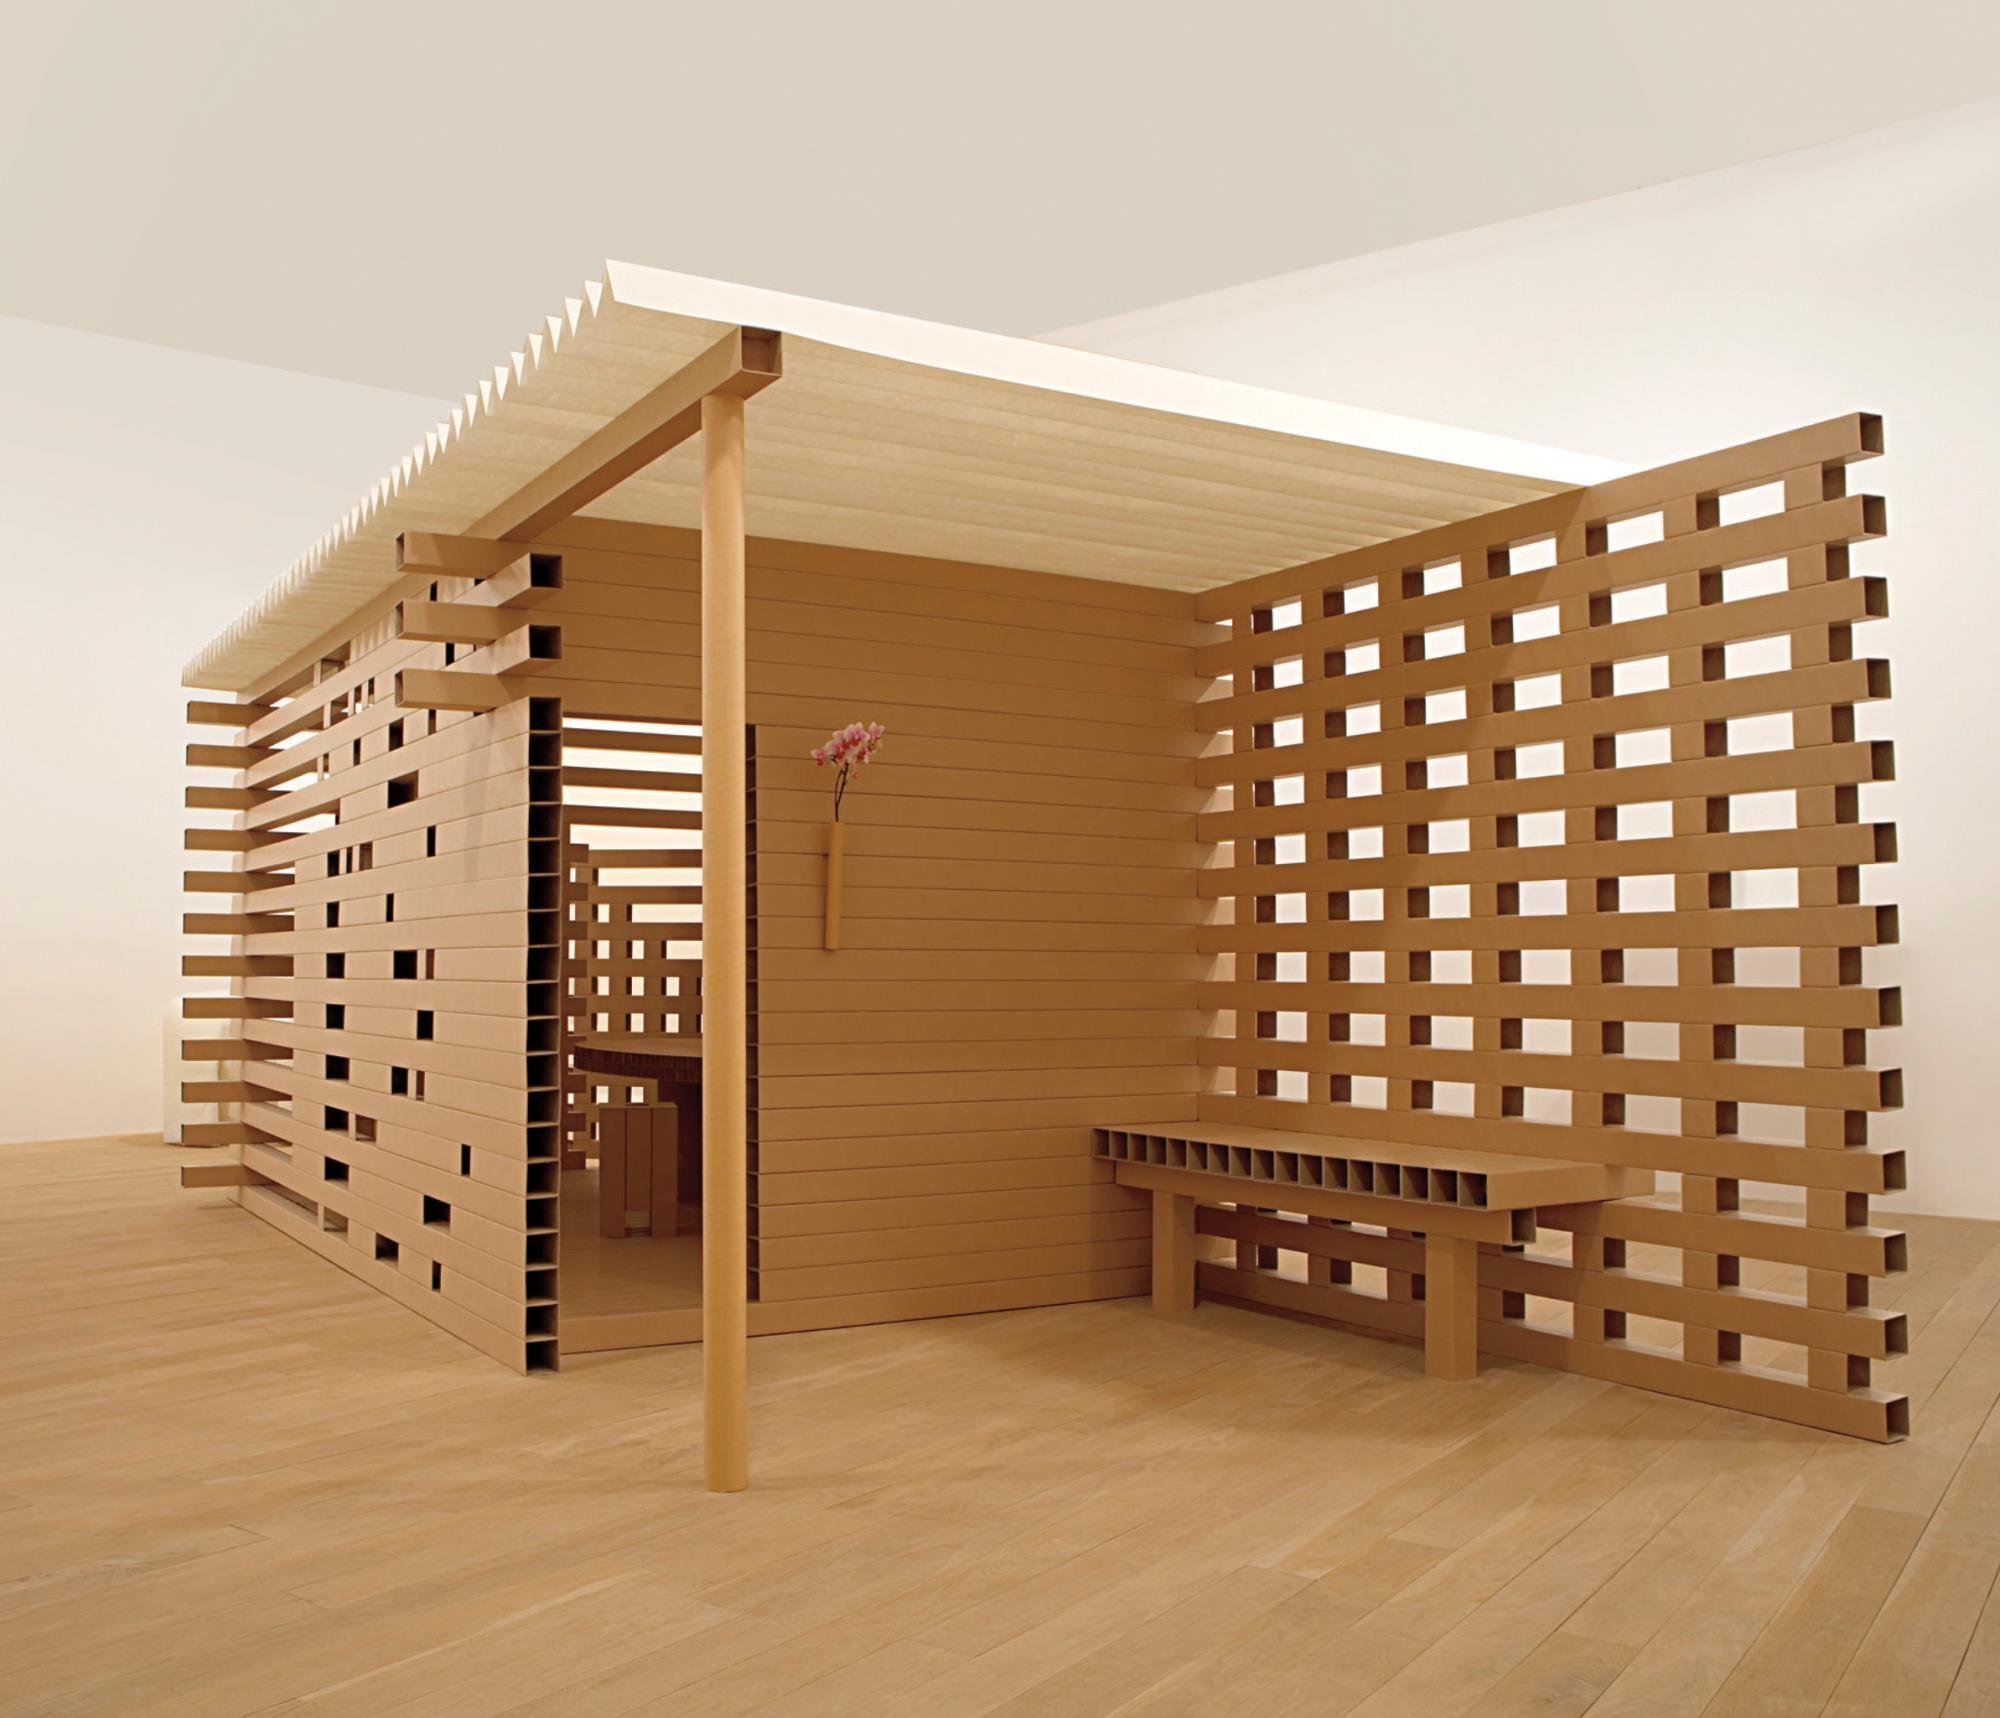 Shigeru Ban 'PTH-02 Paper Tea House', 2006  Paper tubes, Japanese paper, honeycomb cardboard. 200 x 538 x 260 cm (78 3/4 x 211 3/4 x 102 3/8 in.) Manufactured by Shigeru Ban Architects Europe, France.